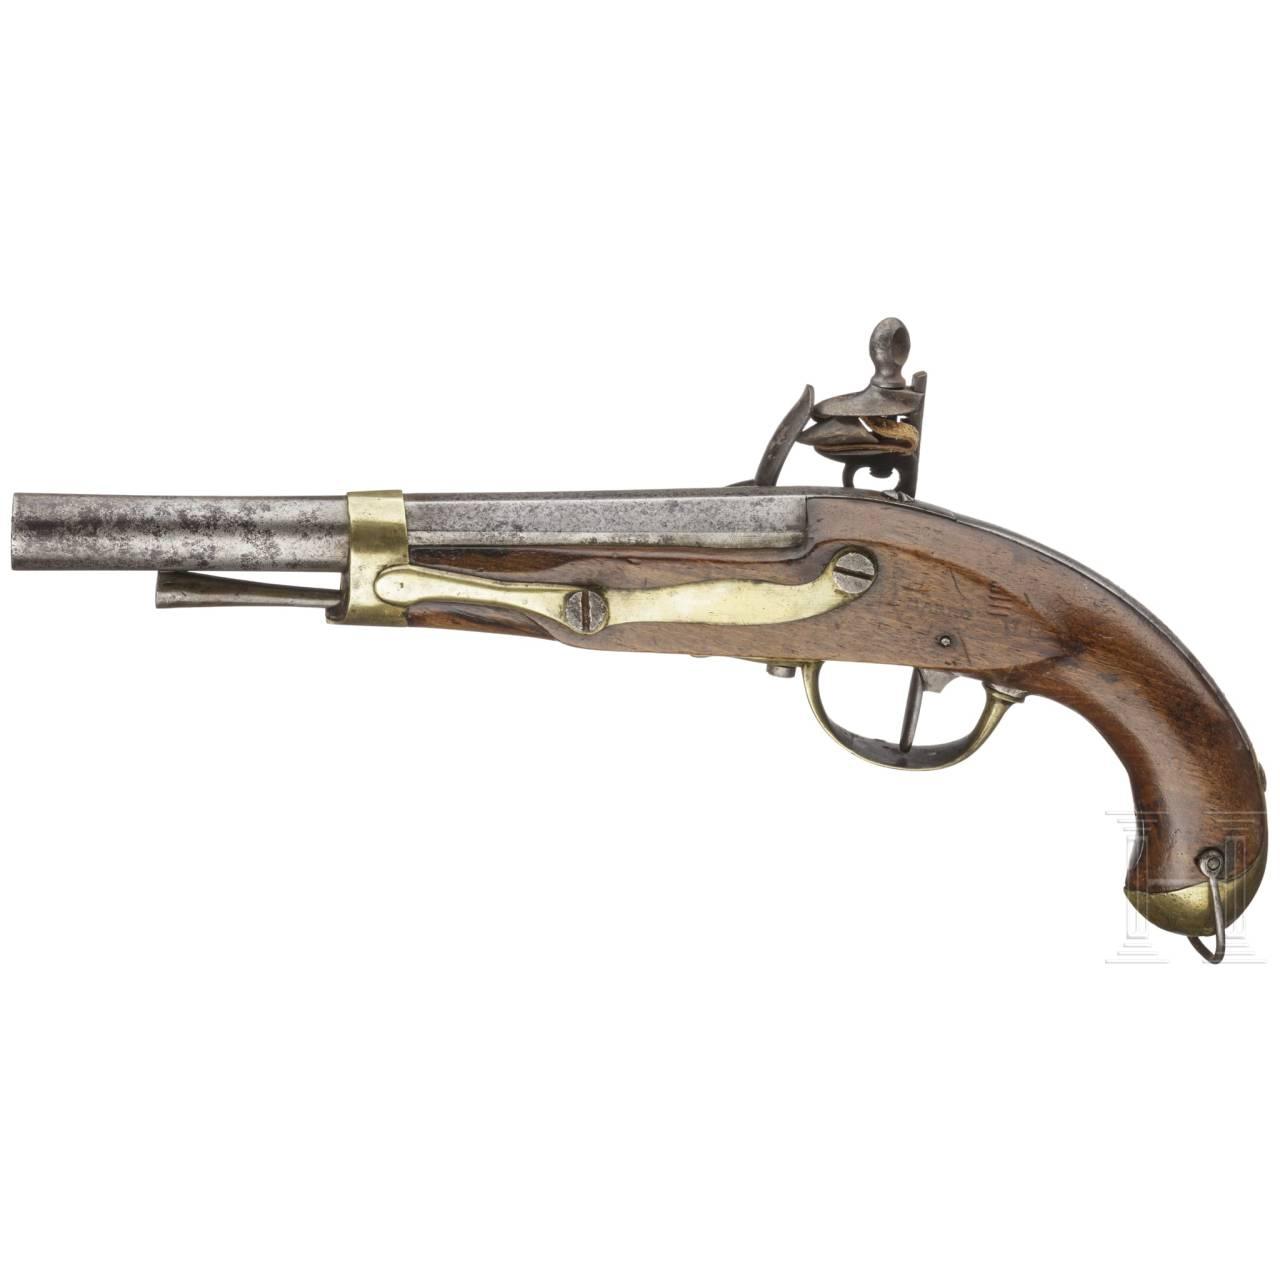 Steinschlosspistole, Eguia Modelo 1815, Kavallerie, Spanien